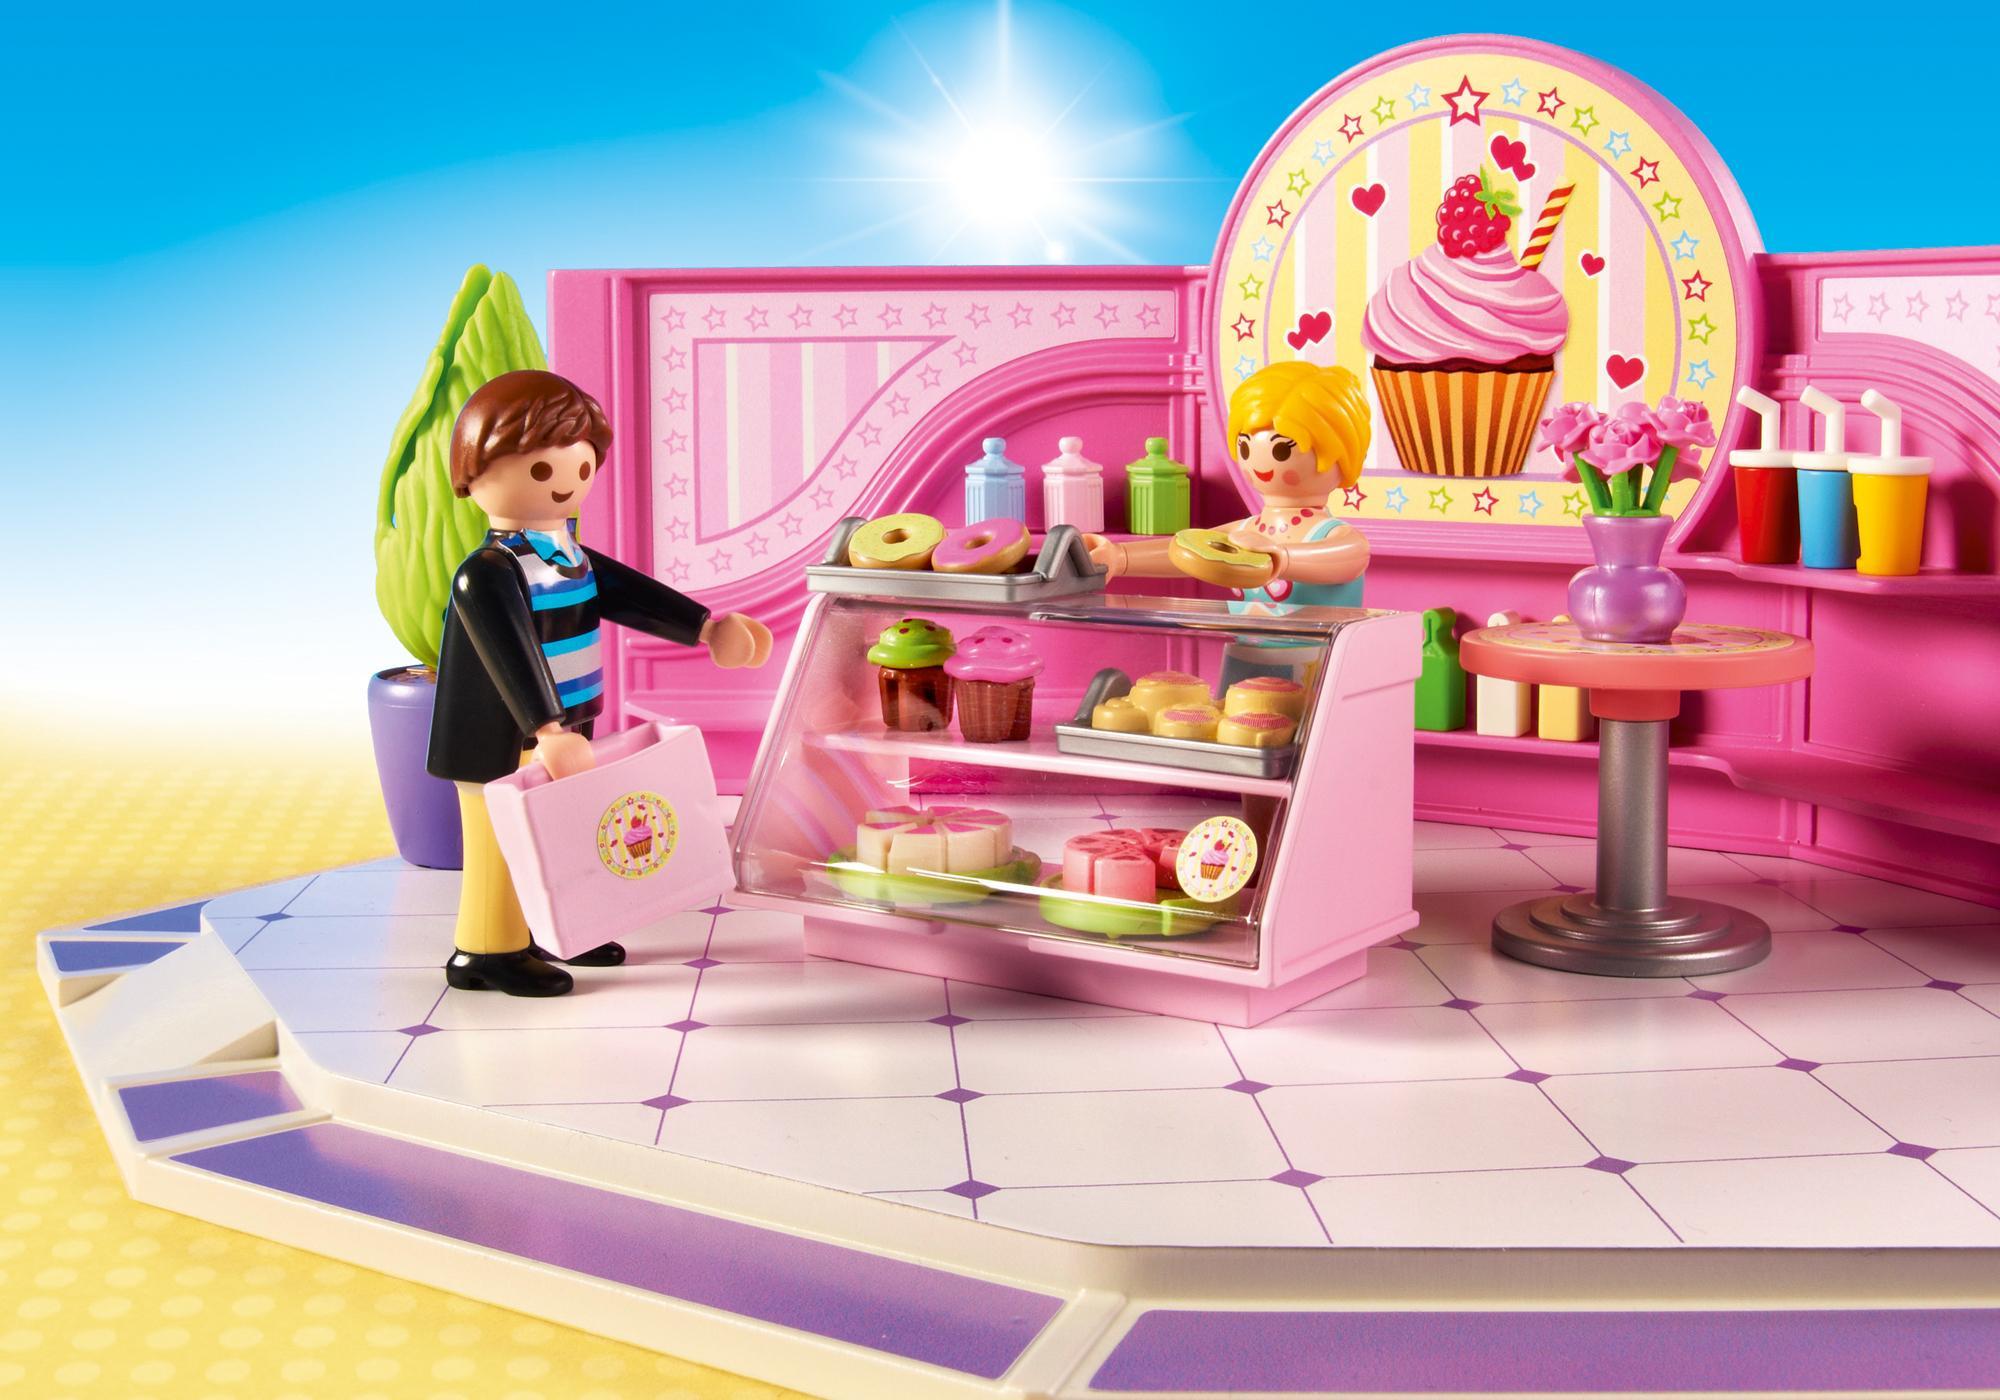 http://media.playmobil.com/i/playmobil/9080_product_extra1/Cupcake Shop